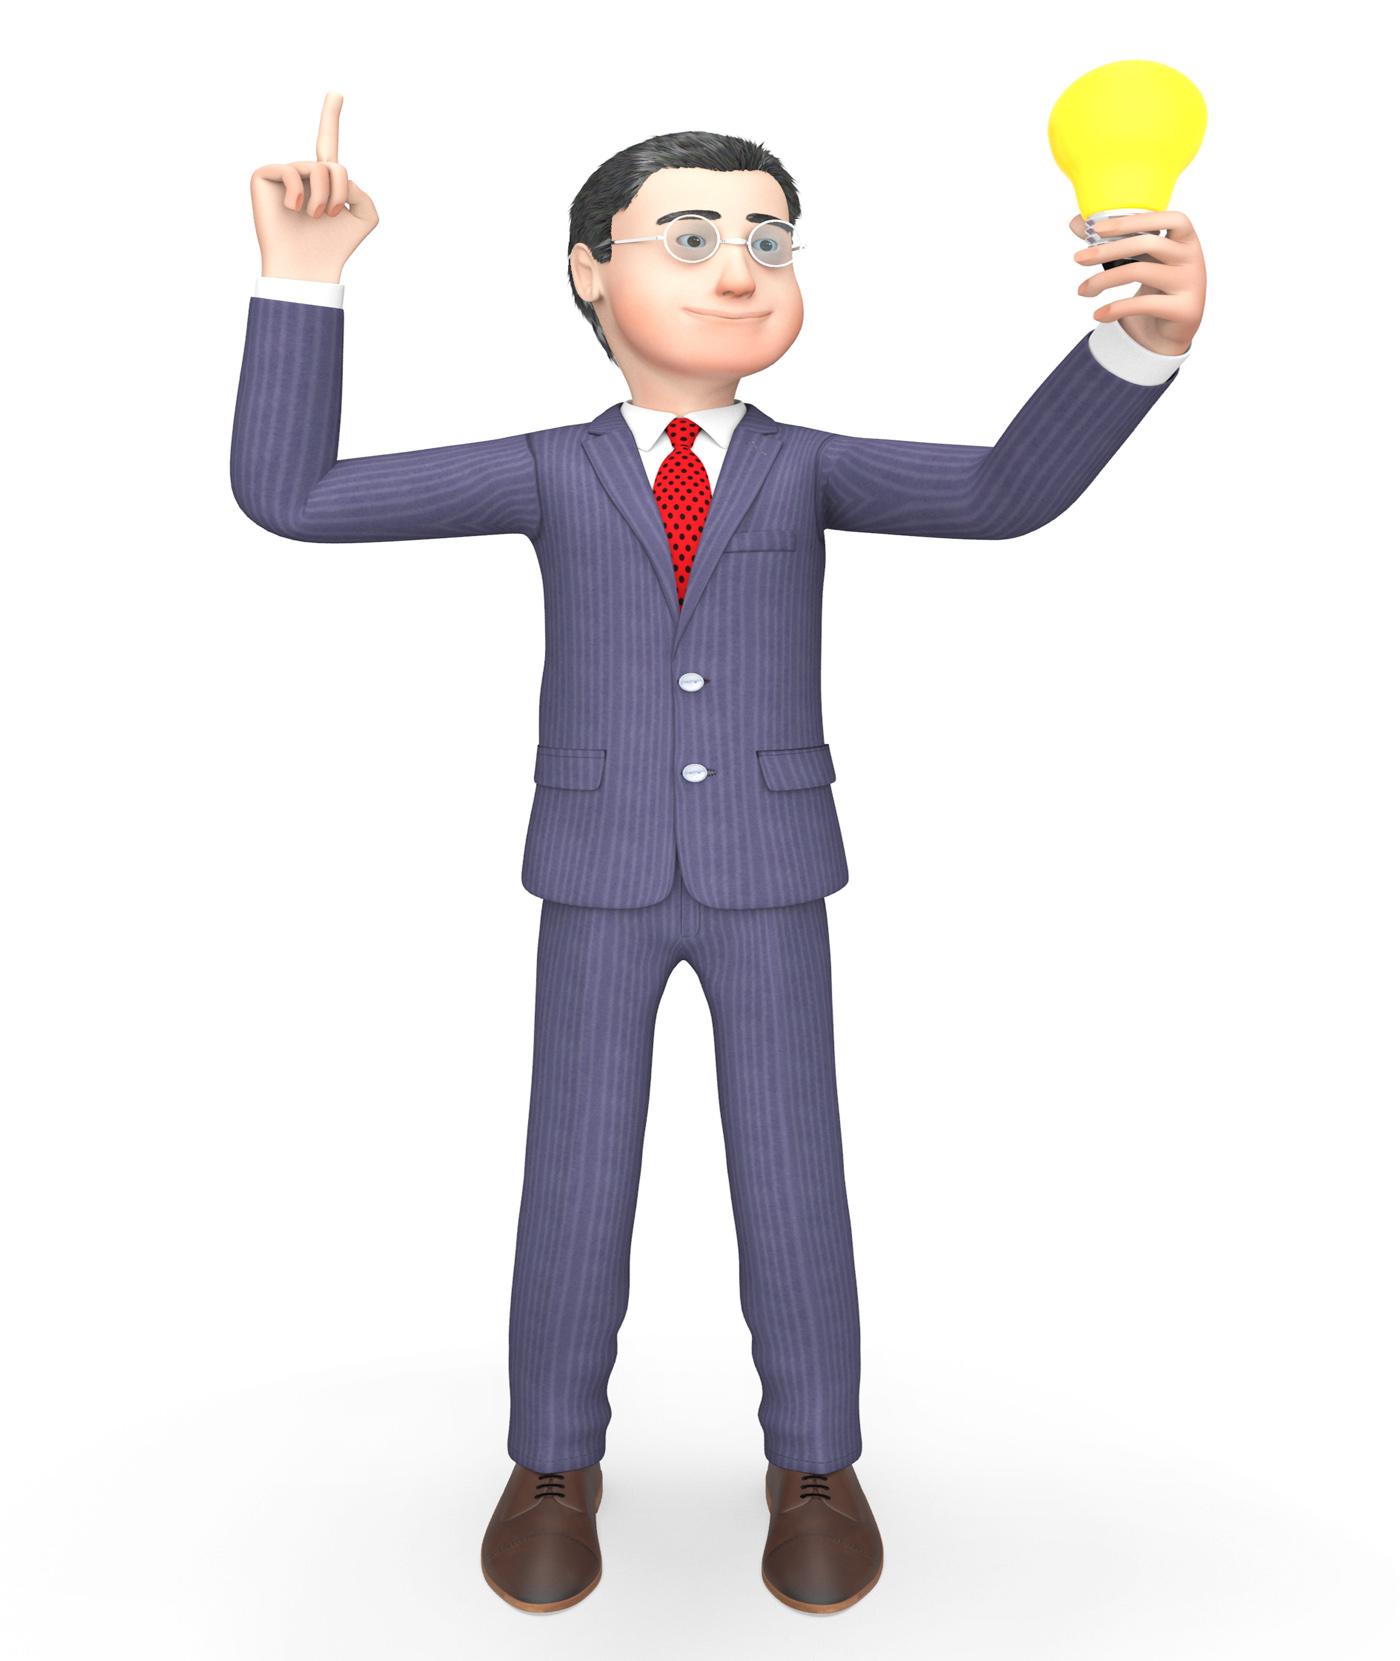 Lightbulb Businessman Means Render Illustration And Think 3d Rendering, 3drendering, Power, Invention, Lamp, HQ Photo